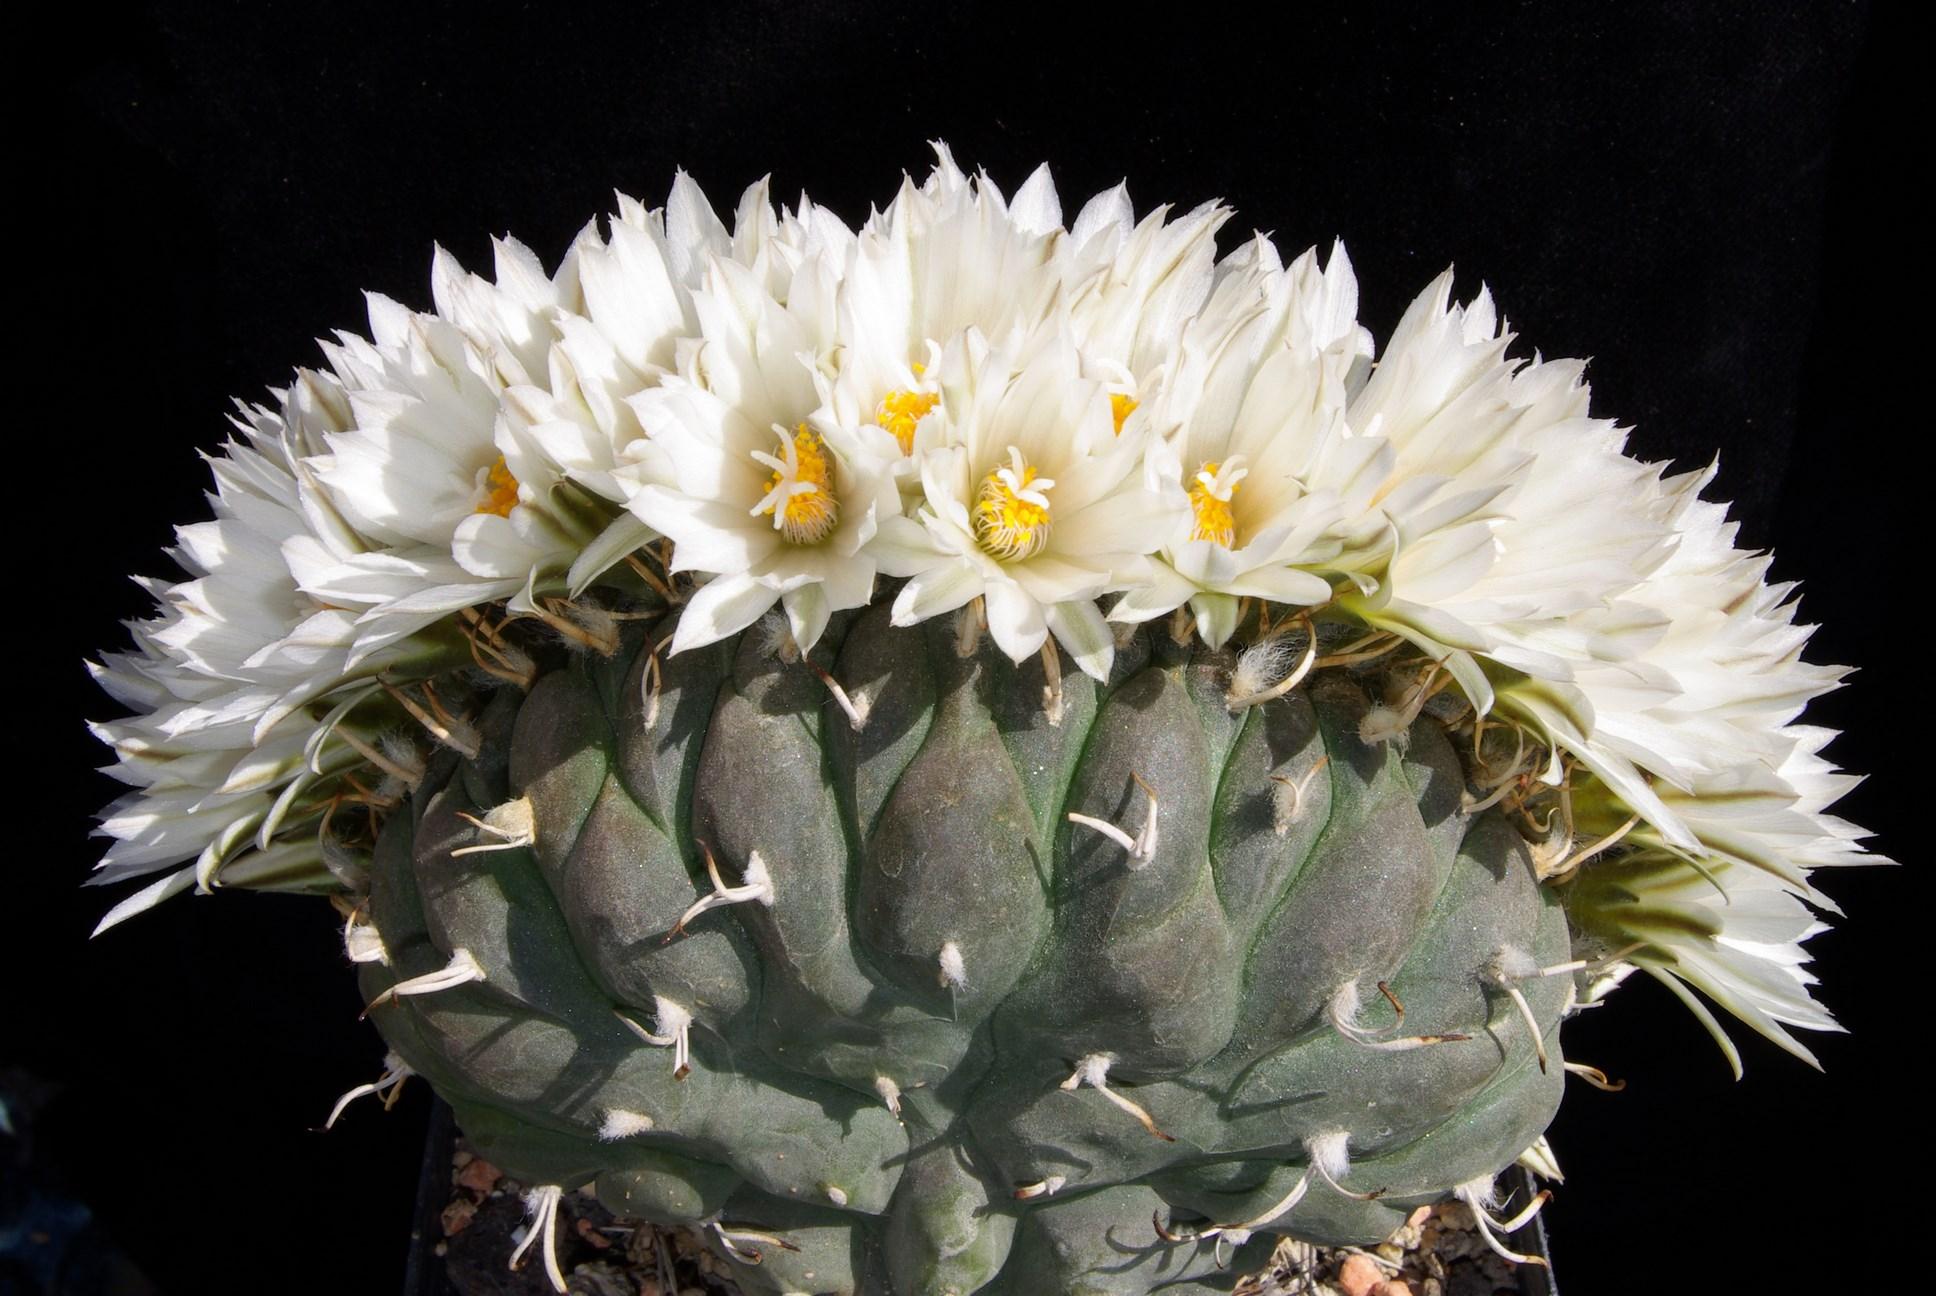 Echinomastus mariposensis